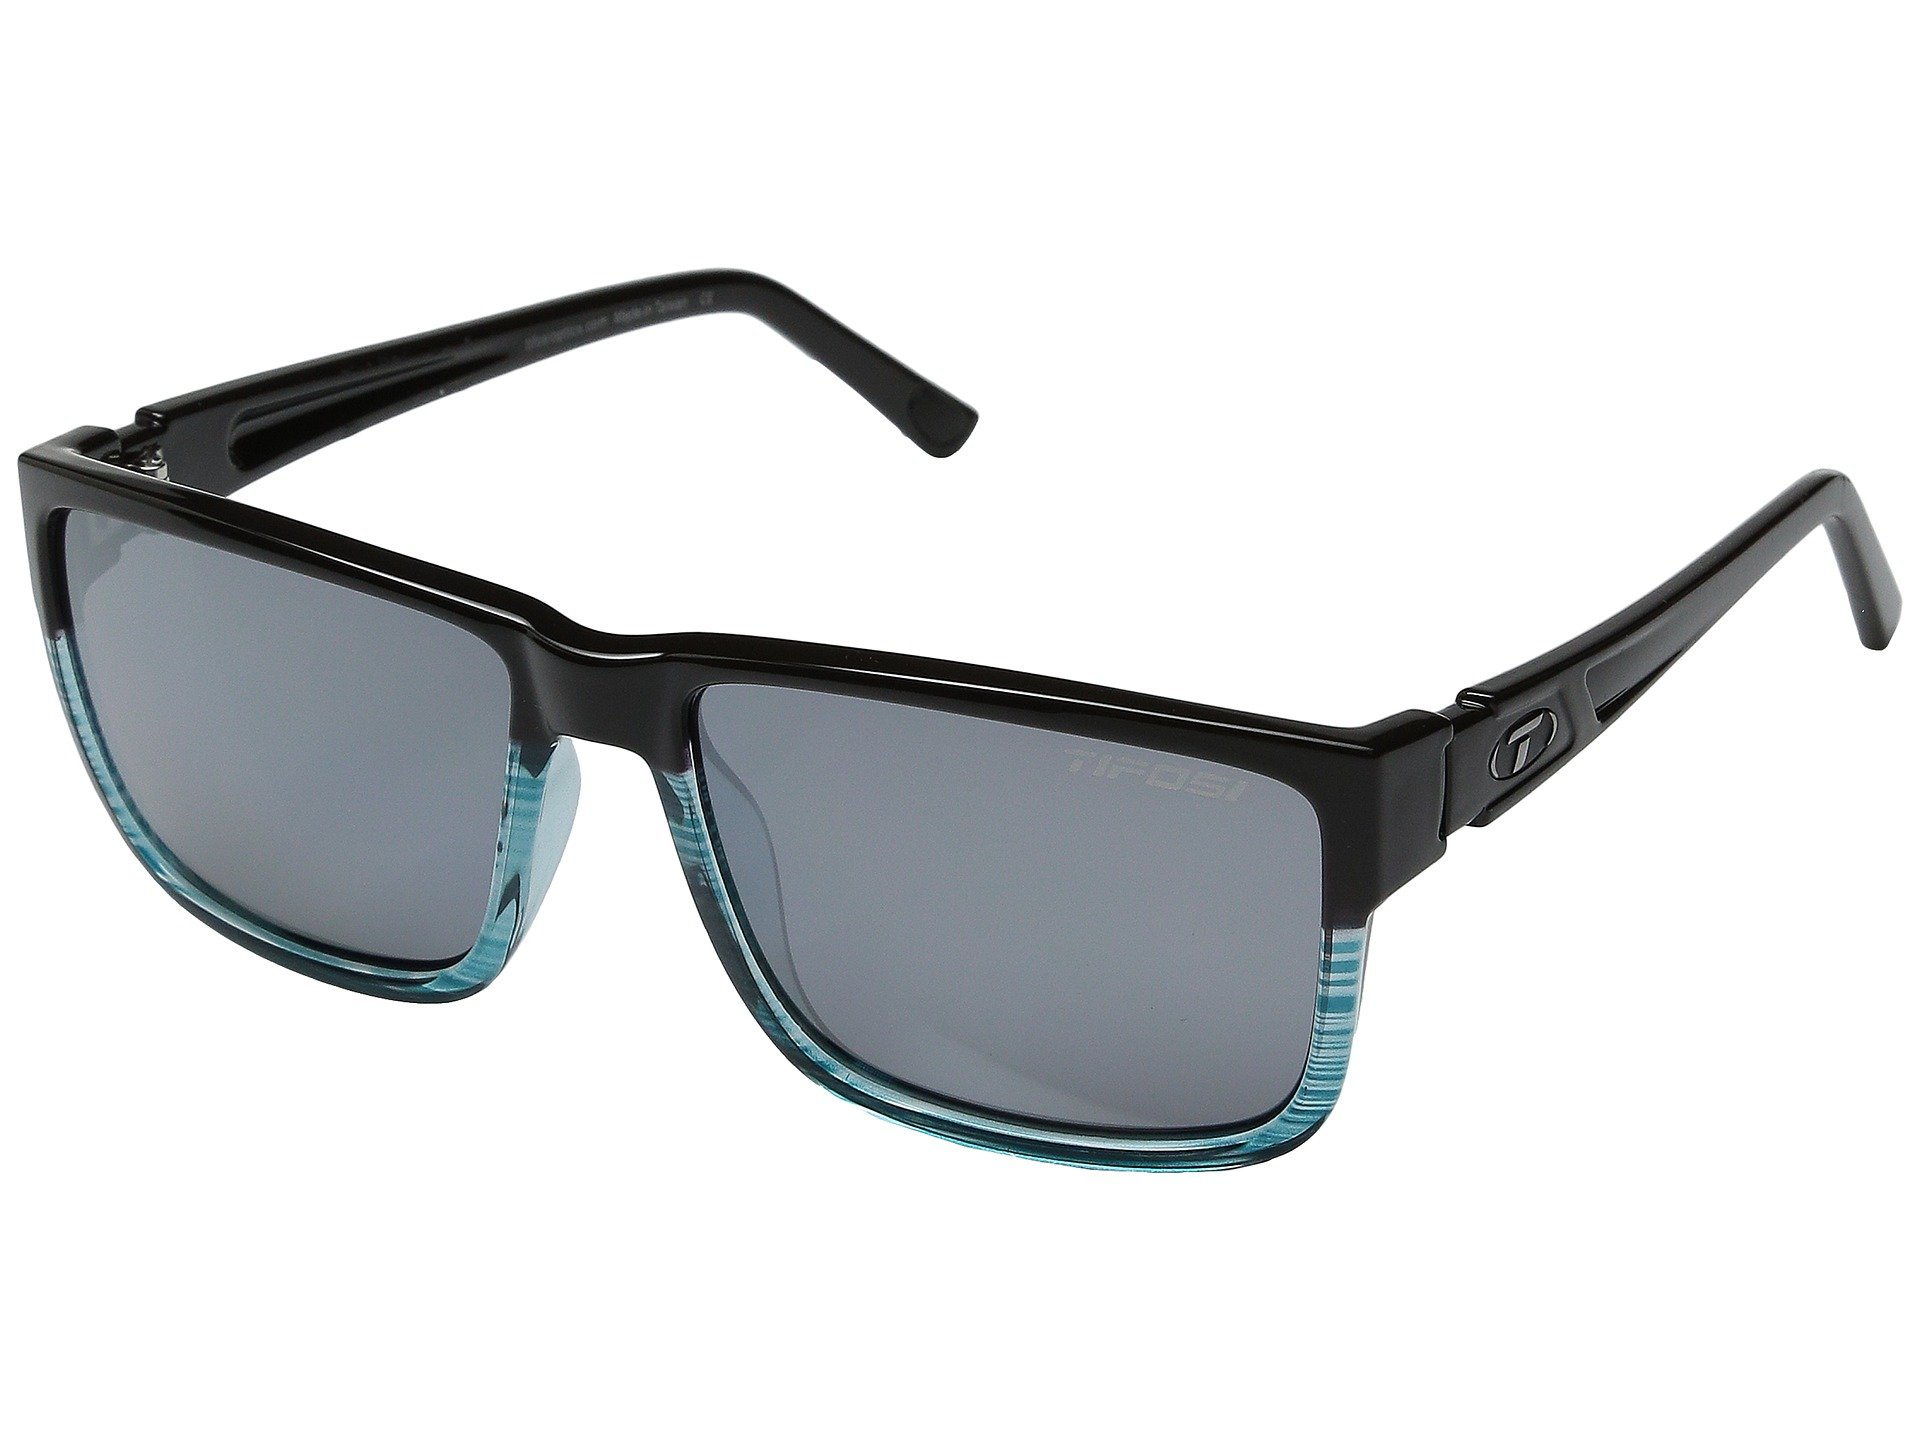 Gafas para Mujer Tifosi Optics Hagen XL  + Tifosi Optics en VeoyCompro.net